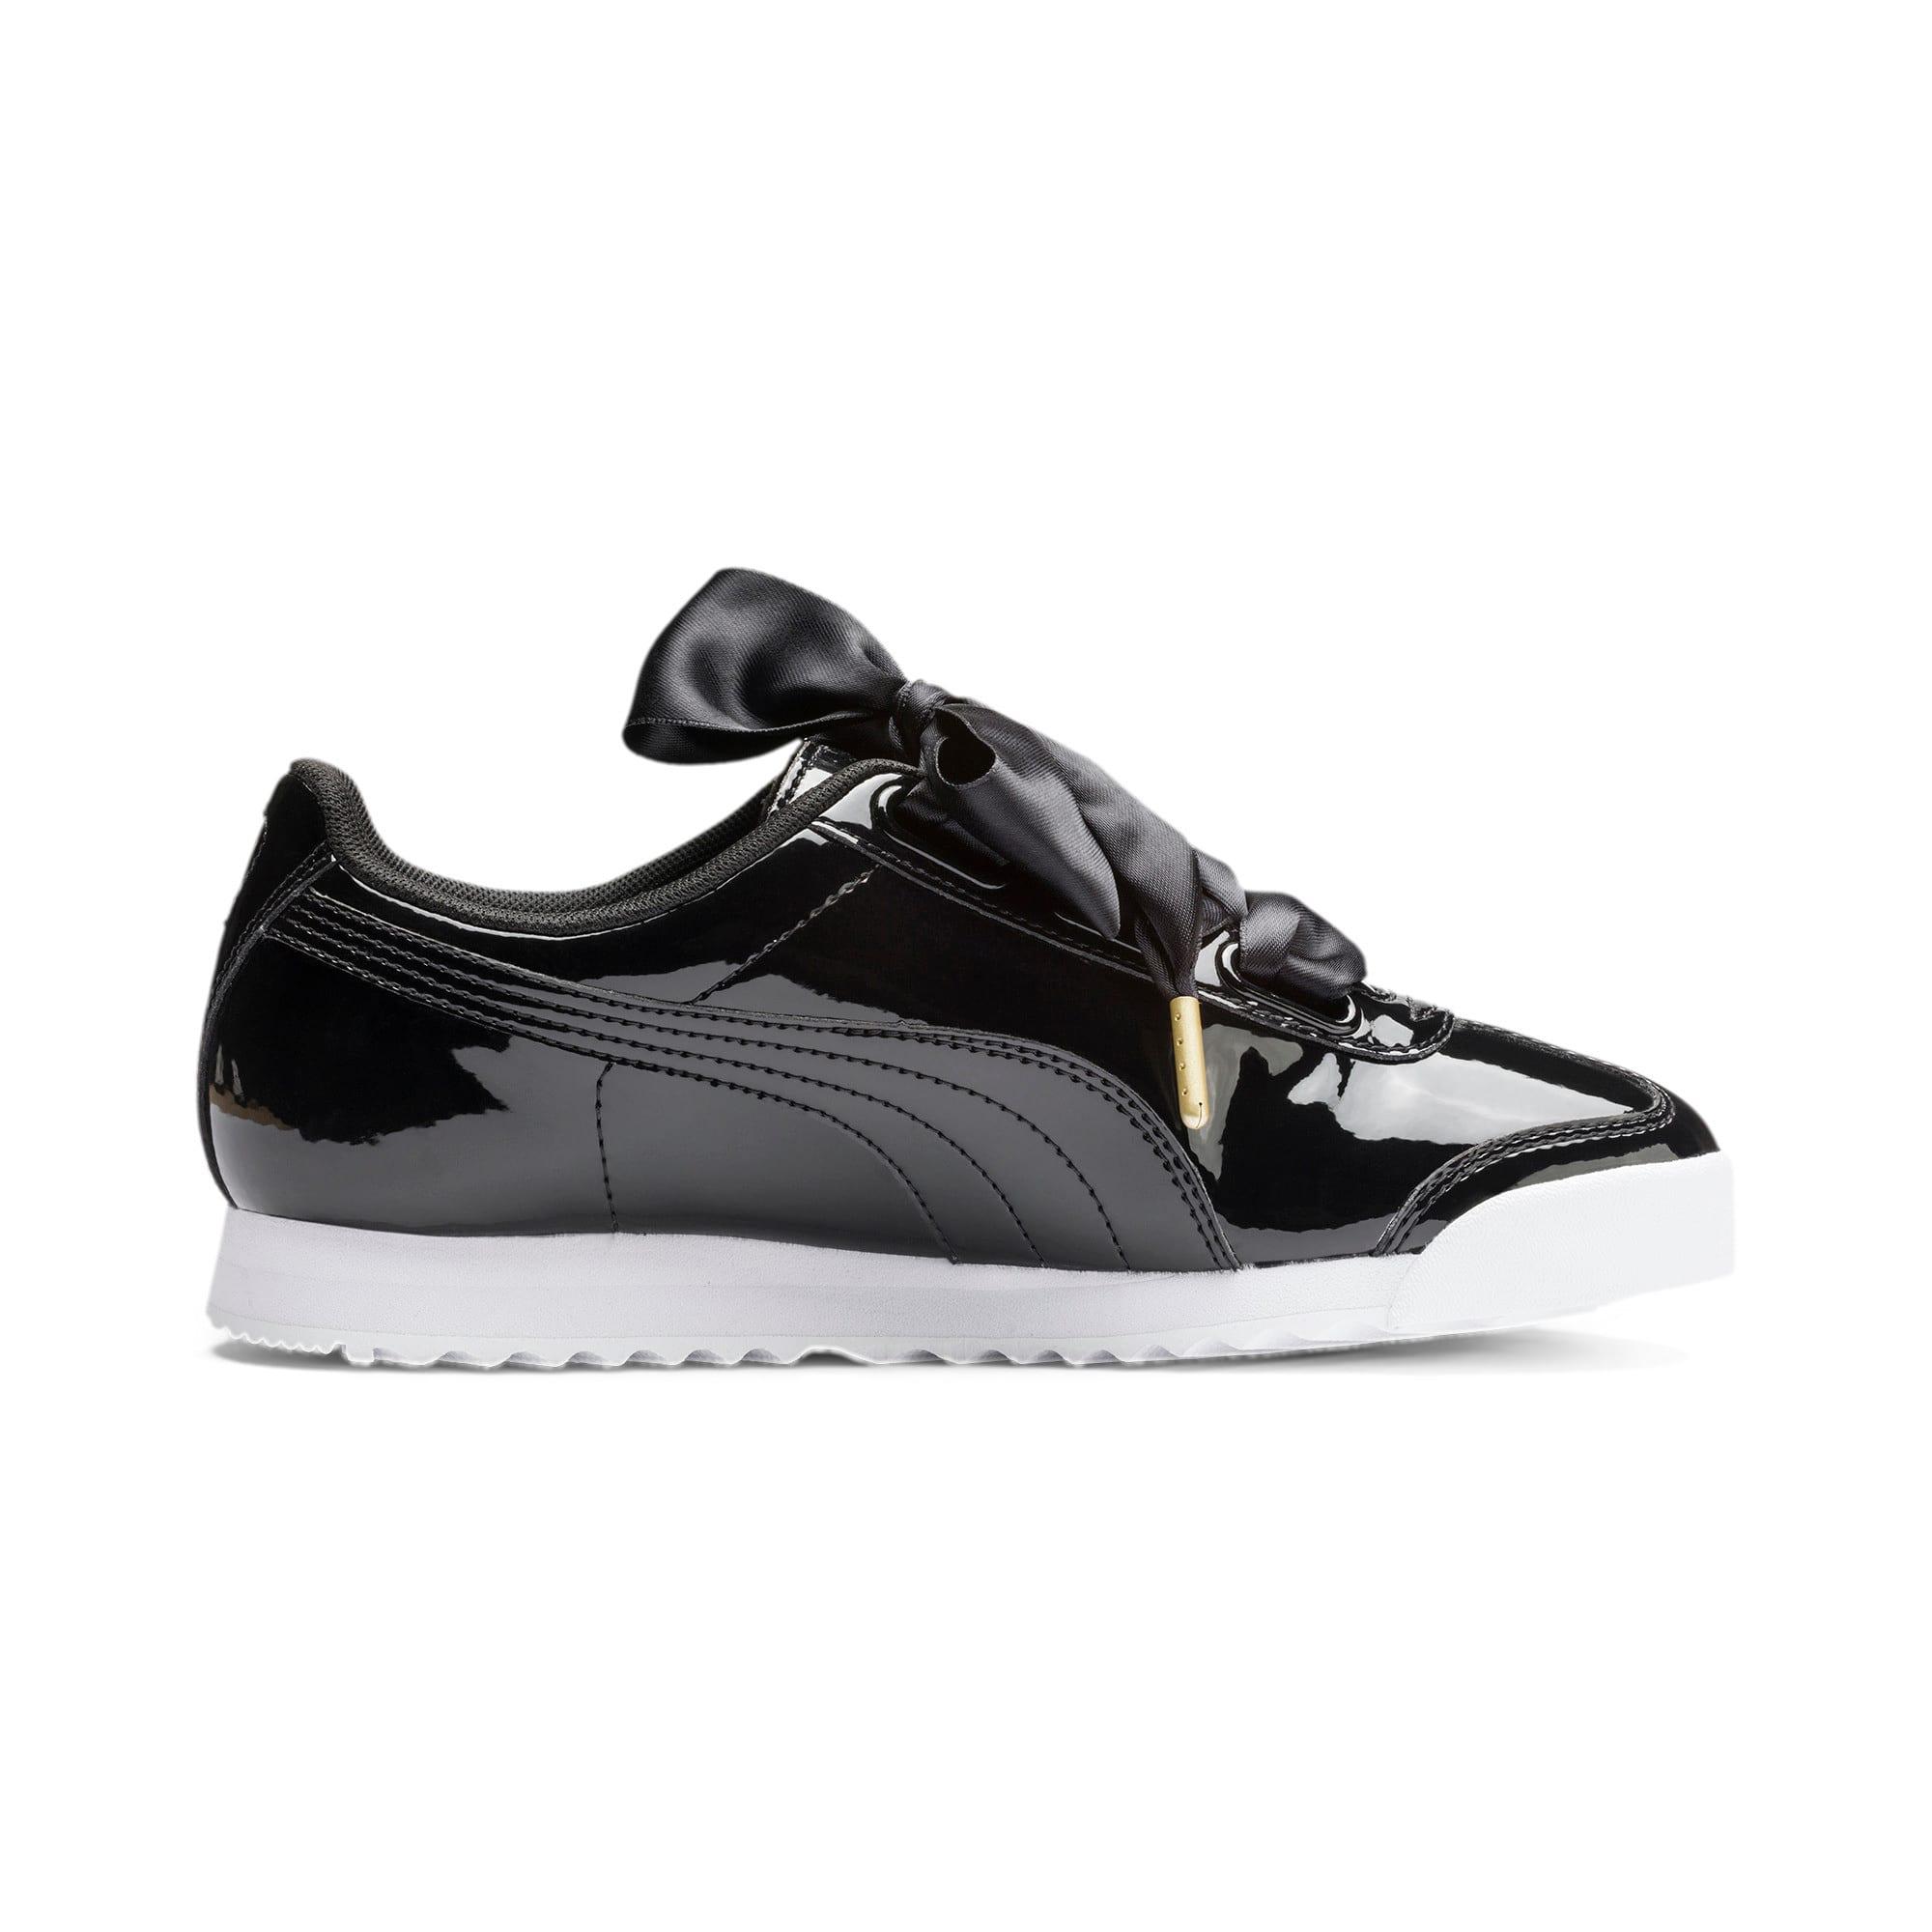 Thumbnail 6 of Roma Heart Patent Women's Sneakers, Puma Black-Puma Team Gold, medium